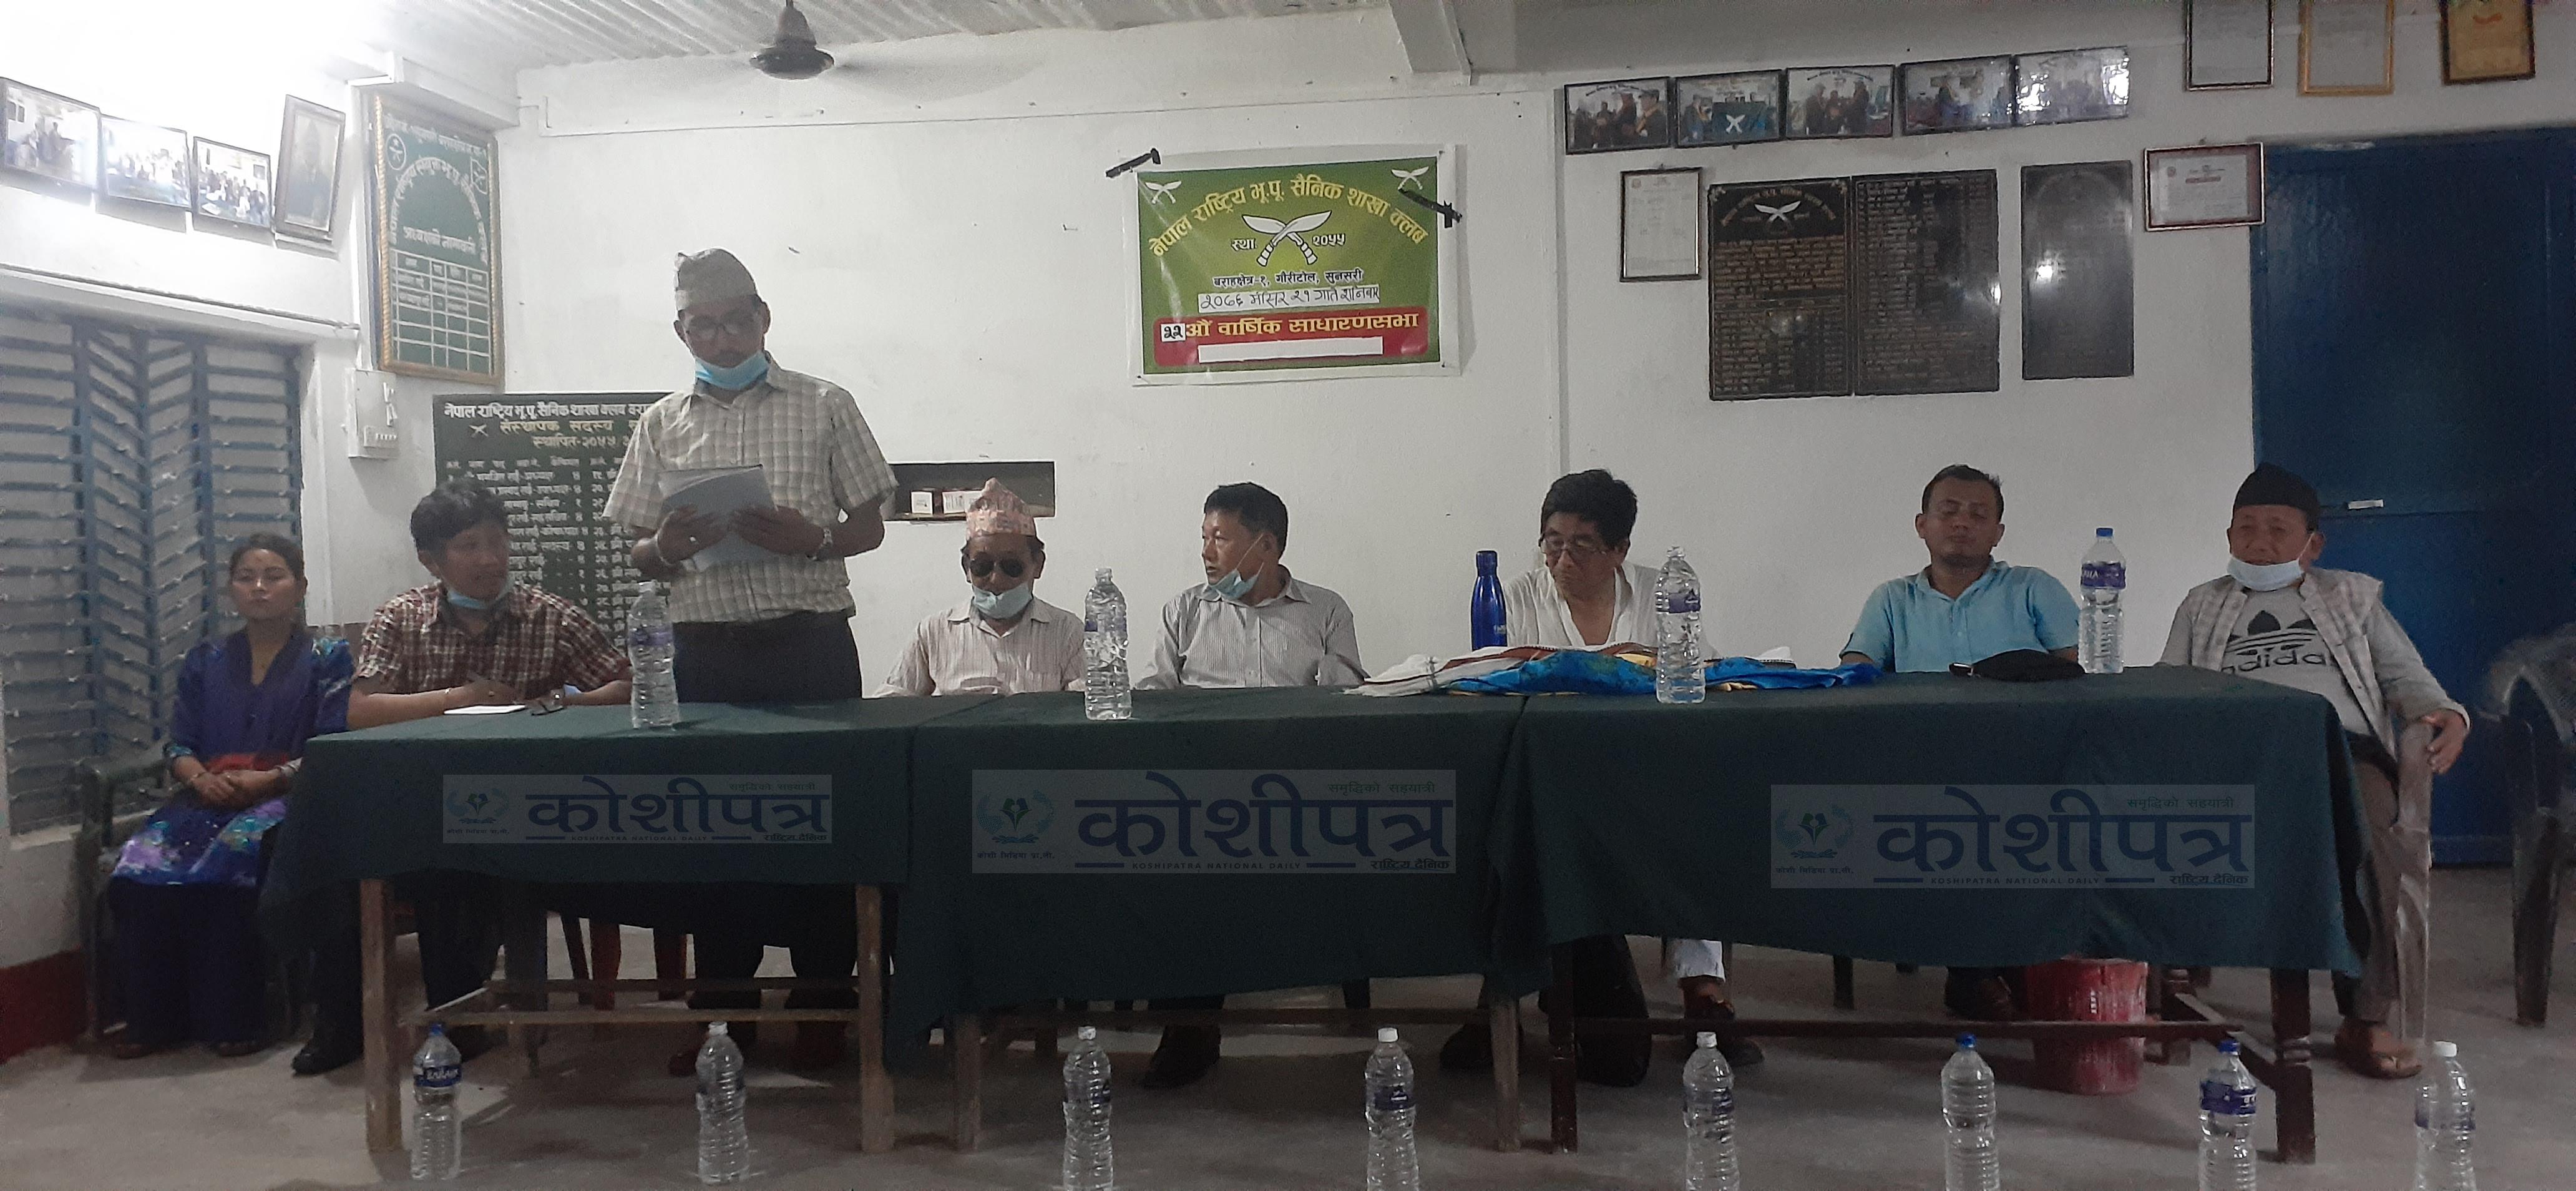 Asok_Rai_Janata_Samajbadi_Party_Nepal1